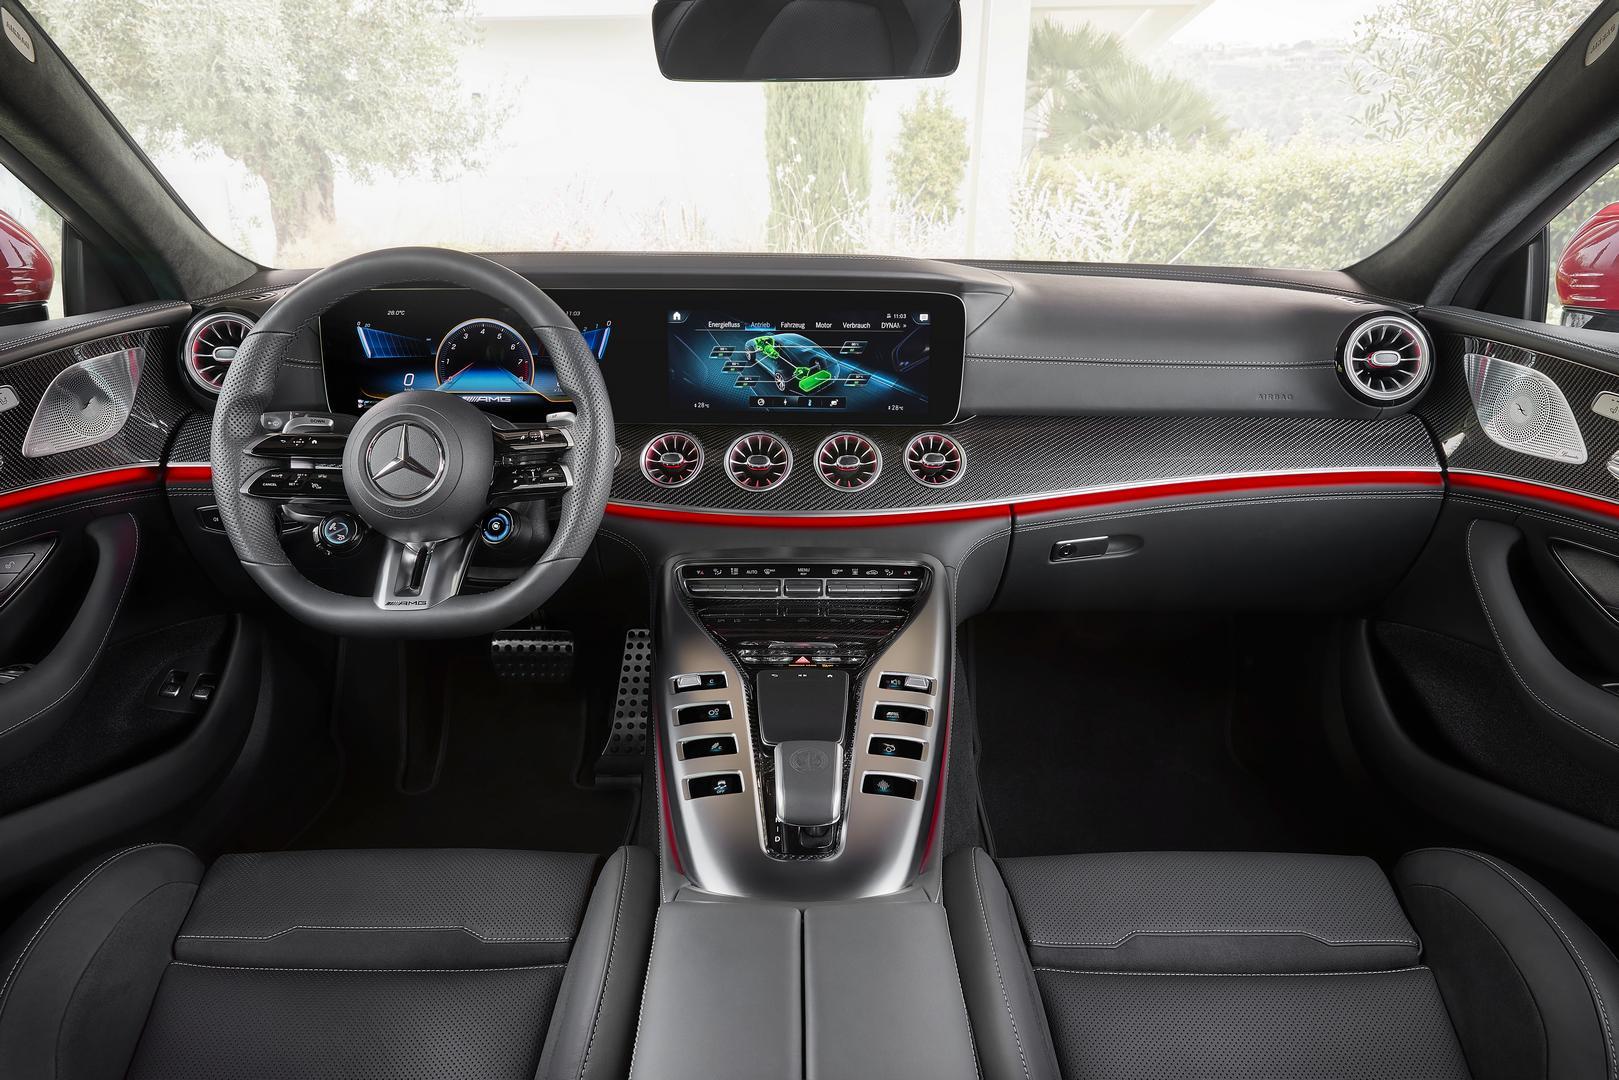 2022 Mercedes-AMG GT 63 S E PERFORMANCE (4MATIC+), 2021Mercedes-AMG GT 63 S E PERFORMANCE cabin